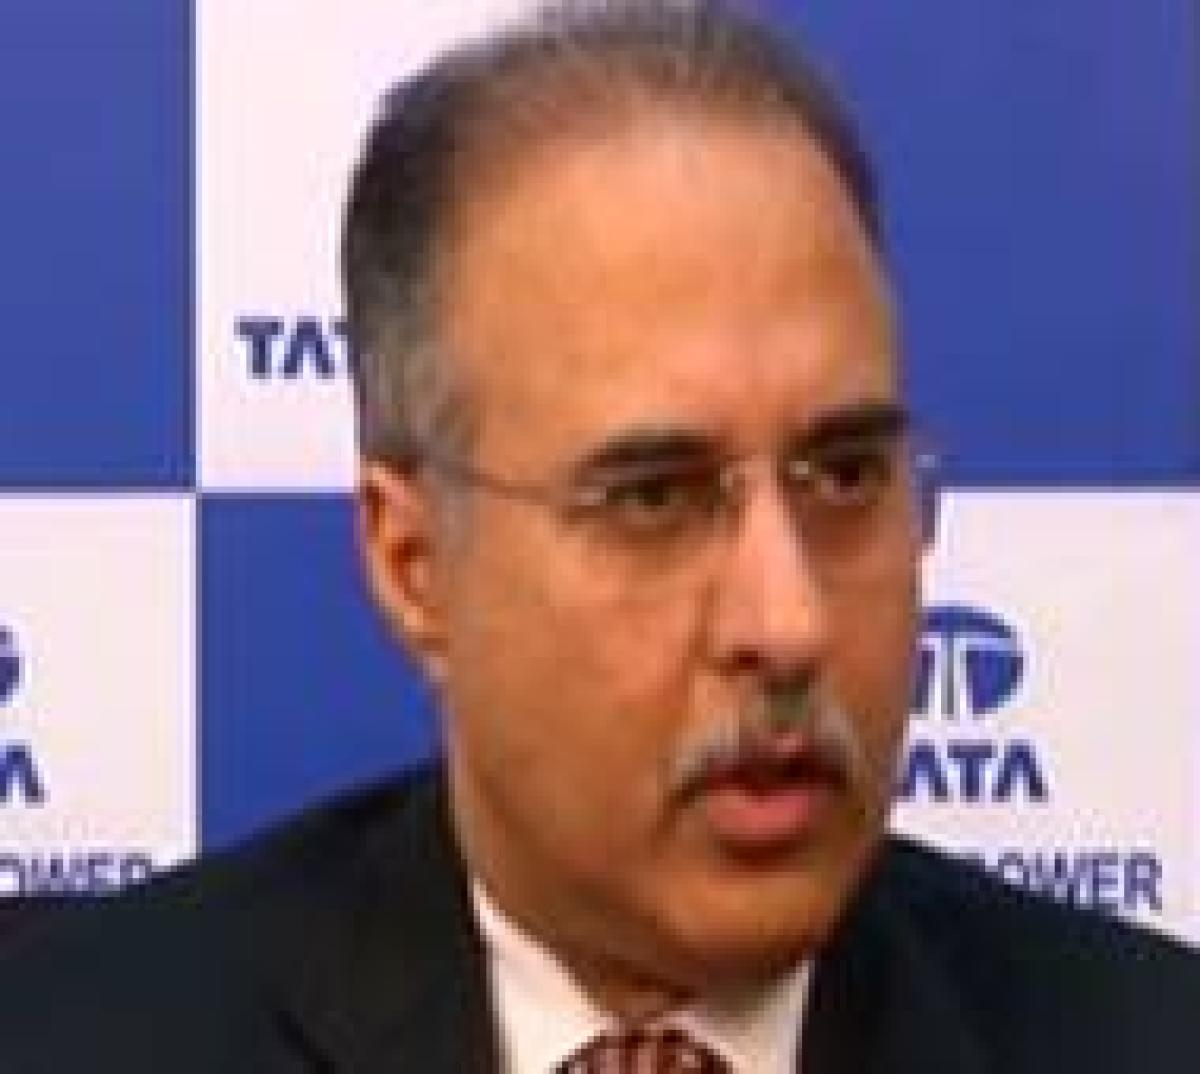 Budget 2016 Reactions: Anil Sardana, Tata Power